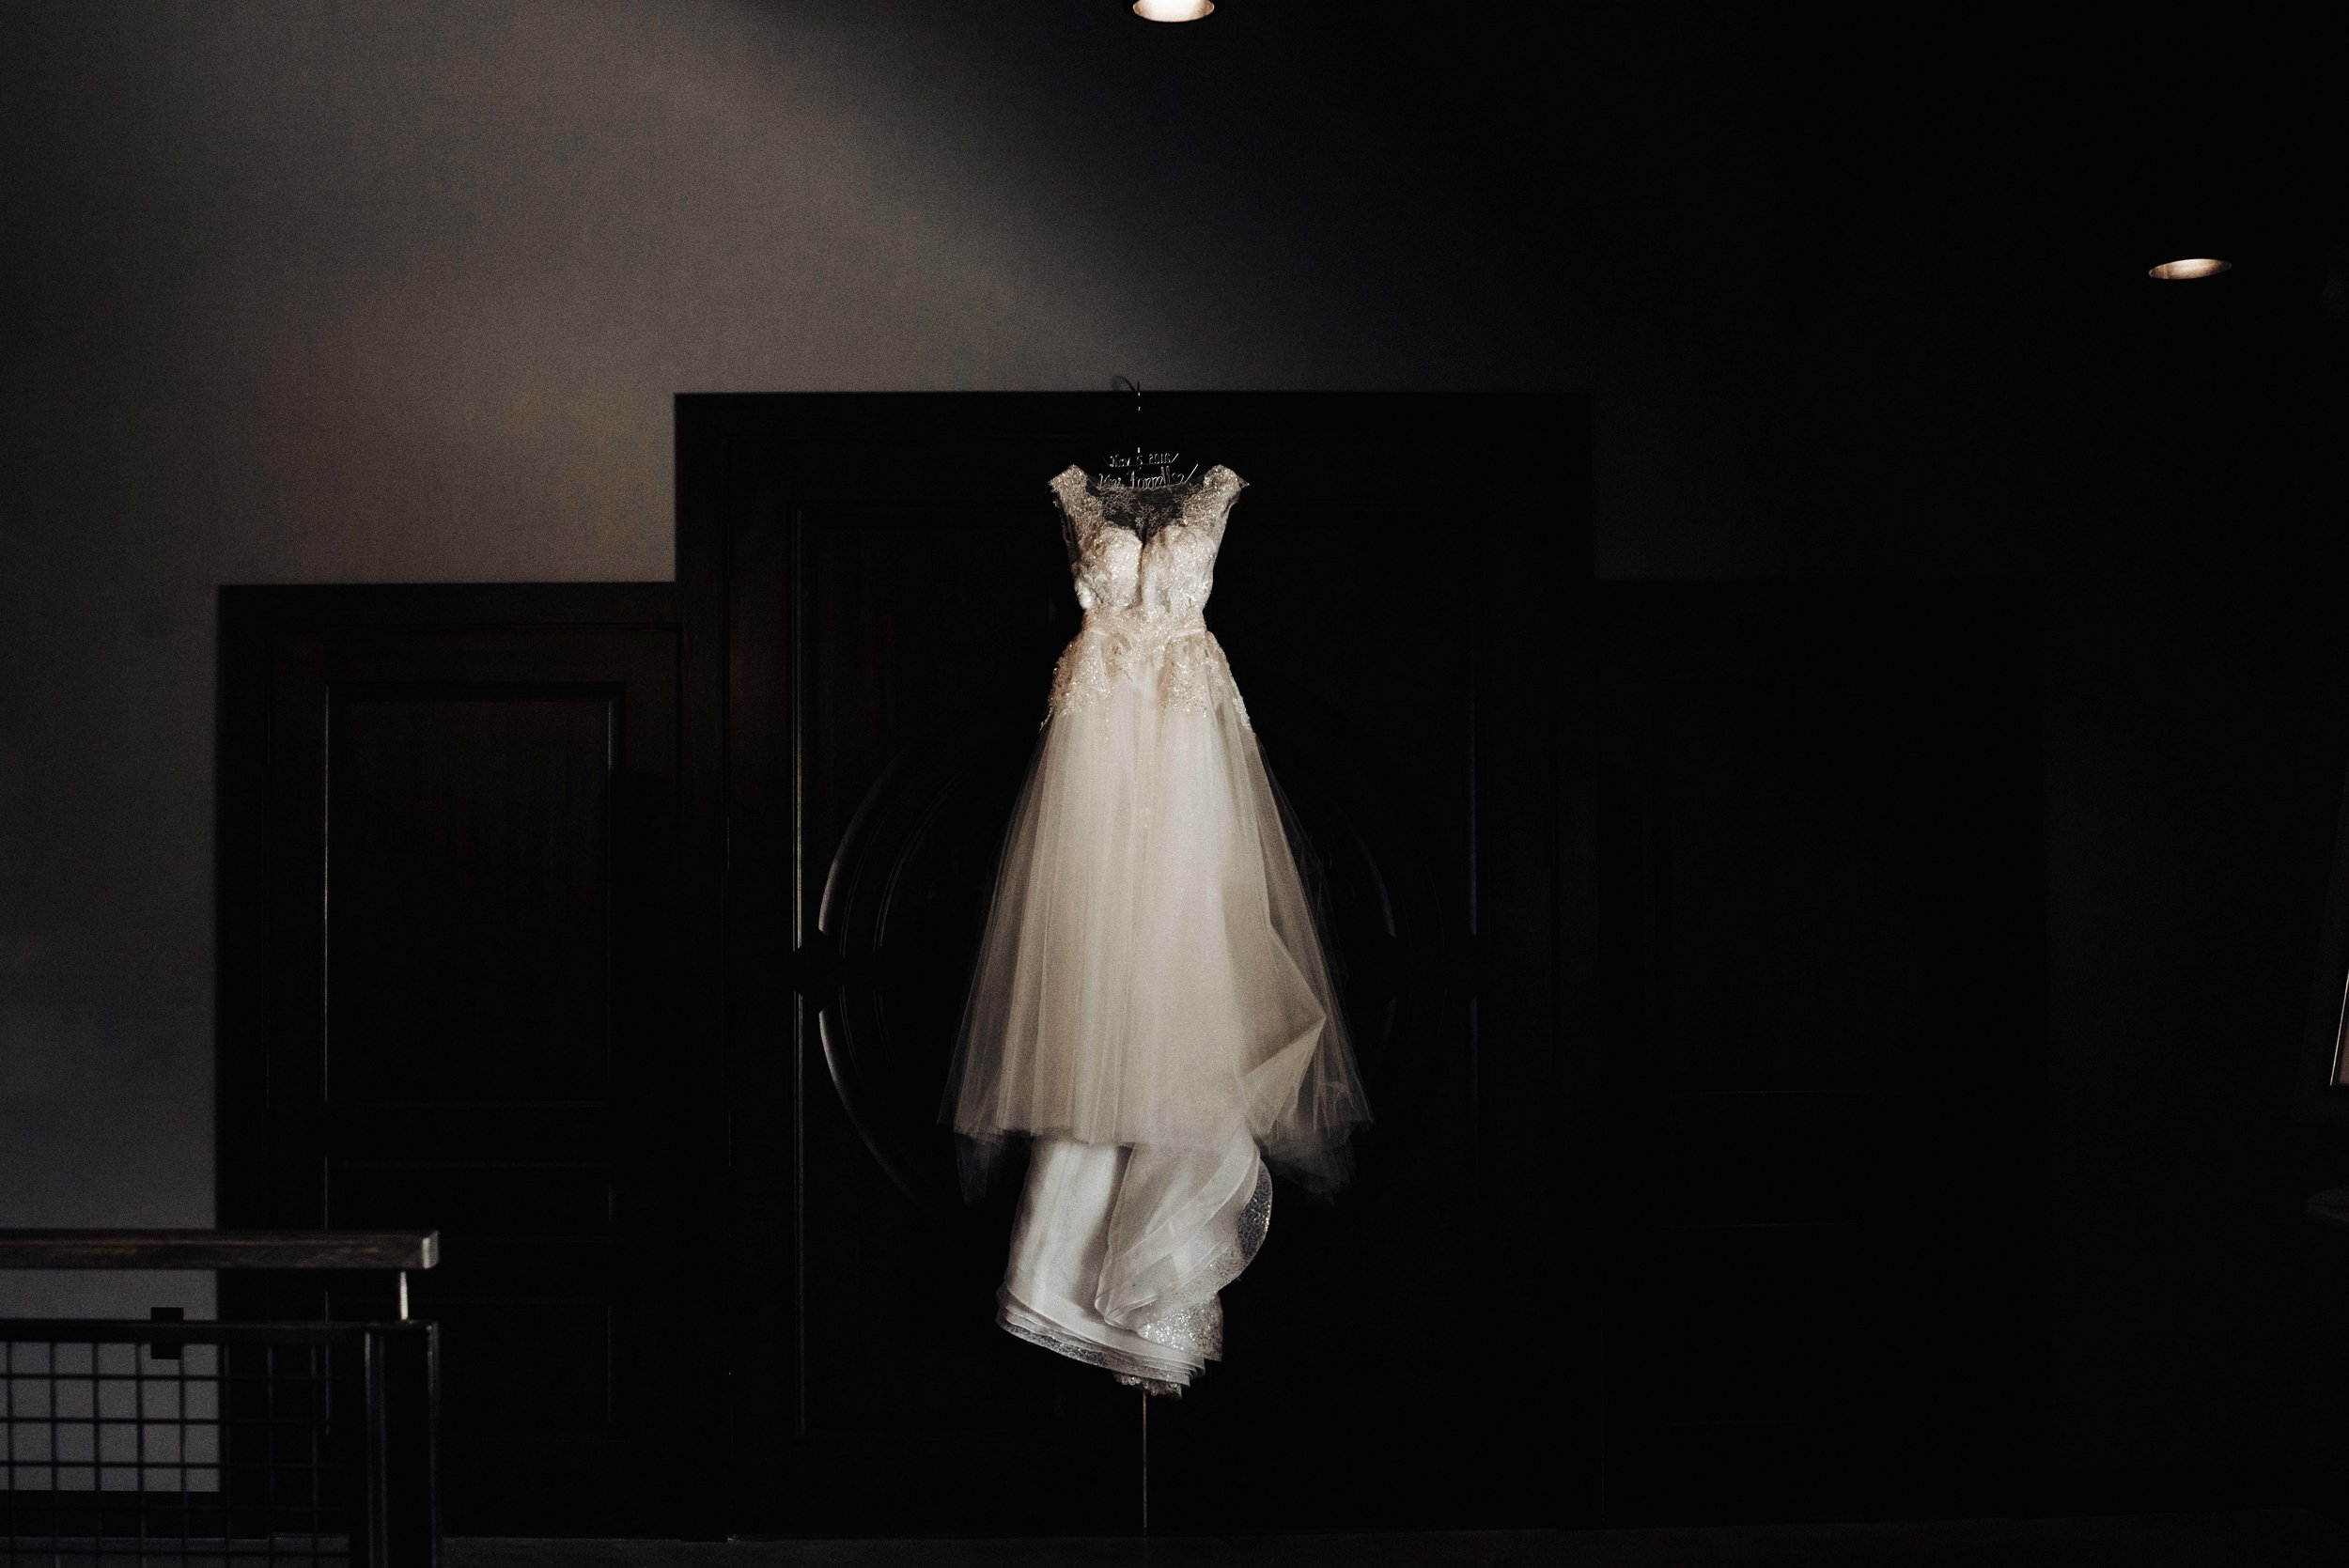 Carlee-Bob-Indianapolis-Wedding-Blog-3.jpg